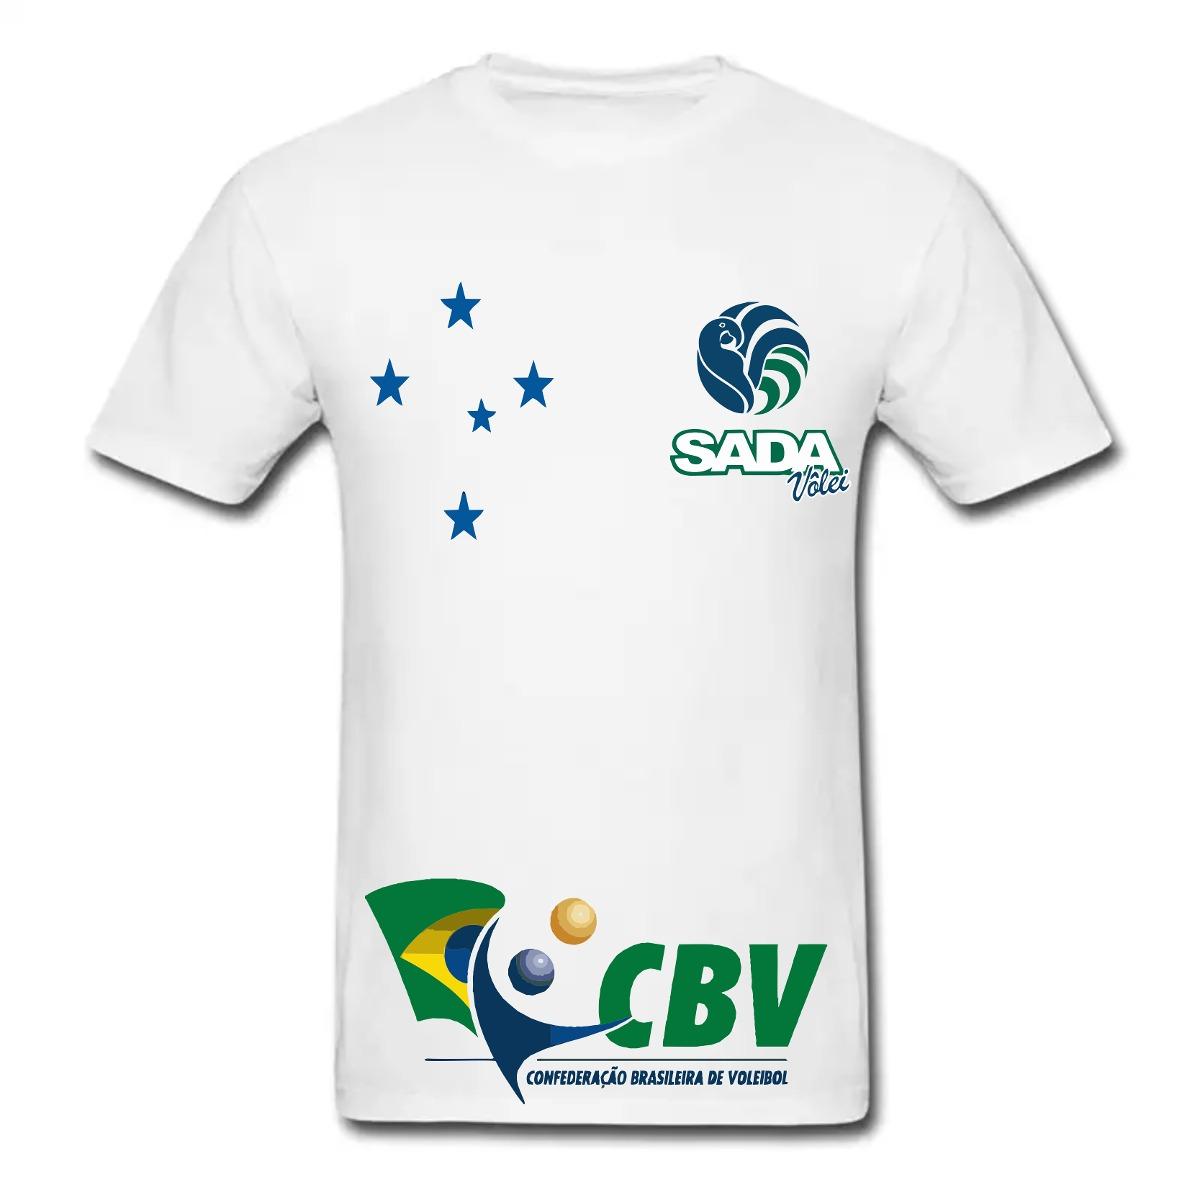 54e5423344d32 Camiseta De Volei